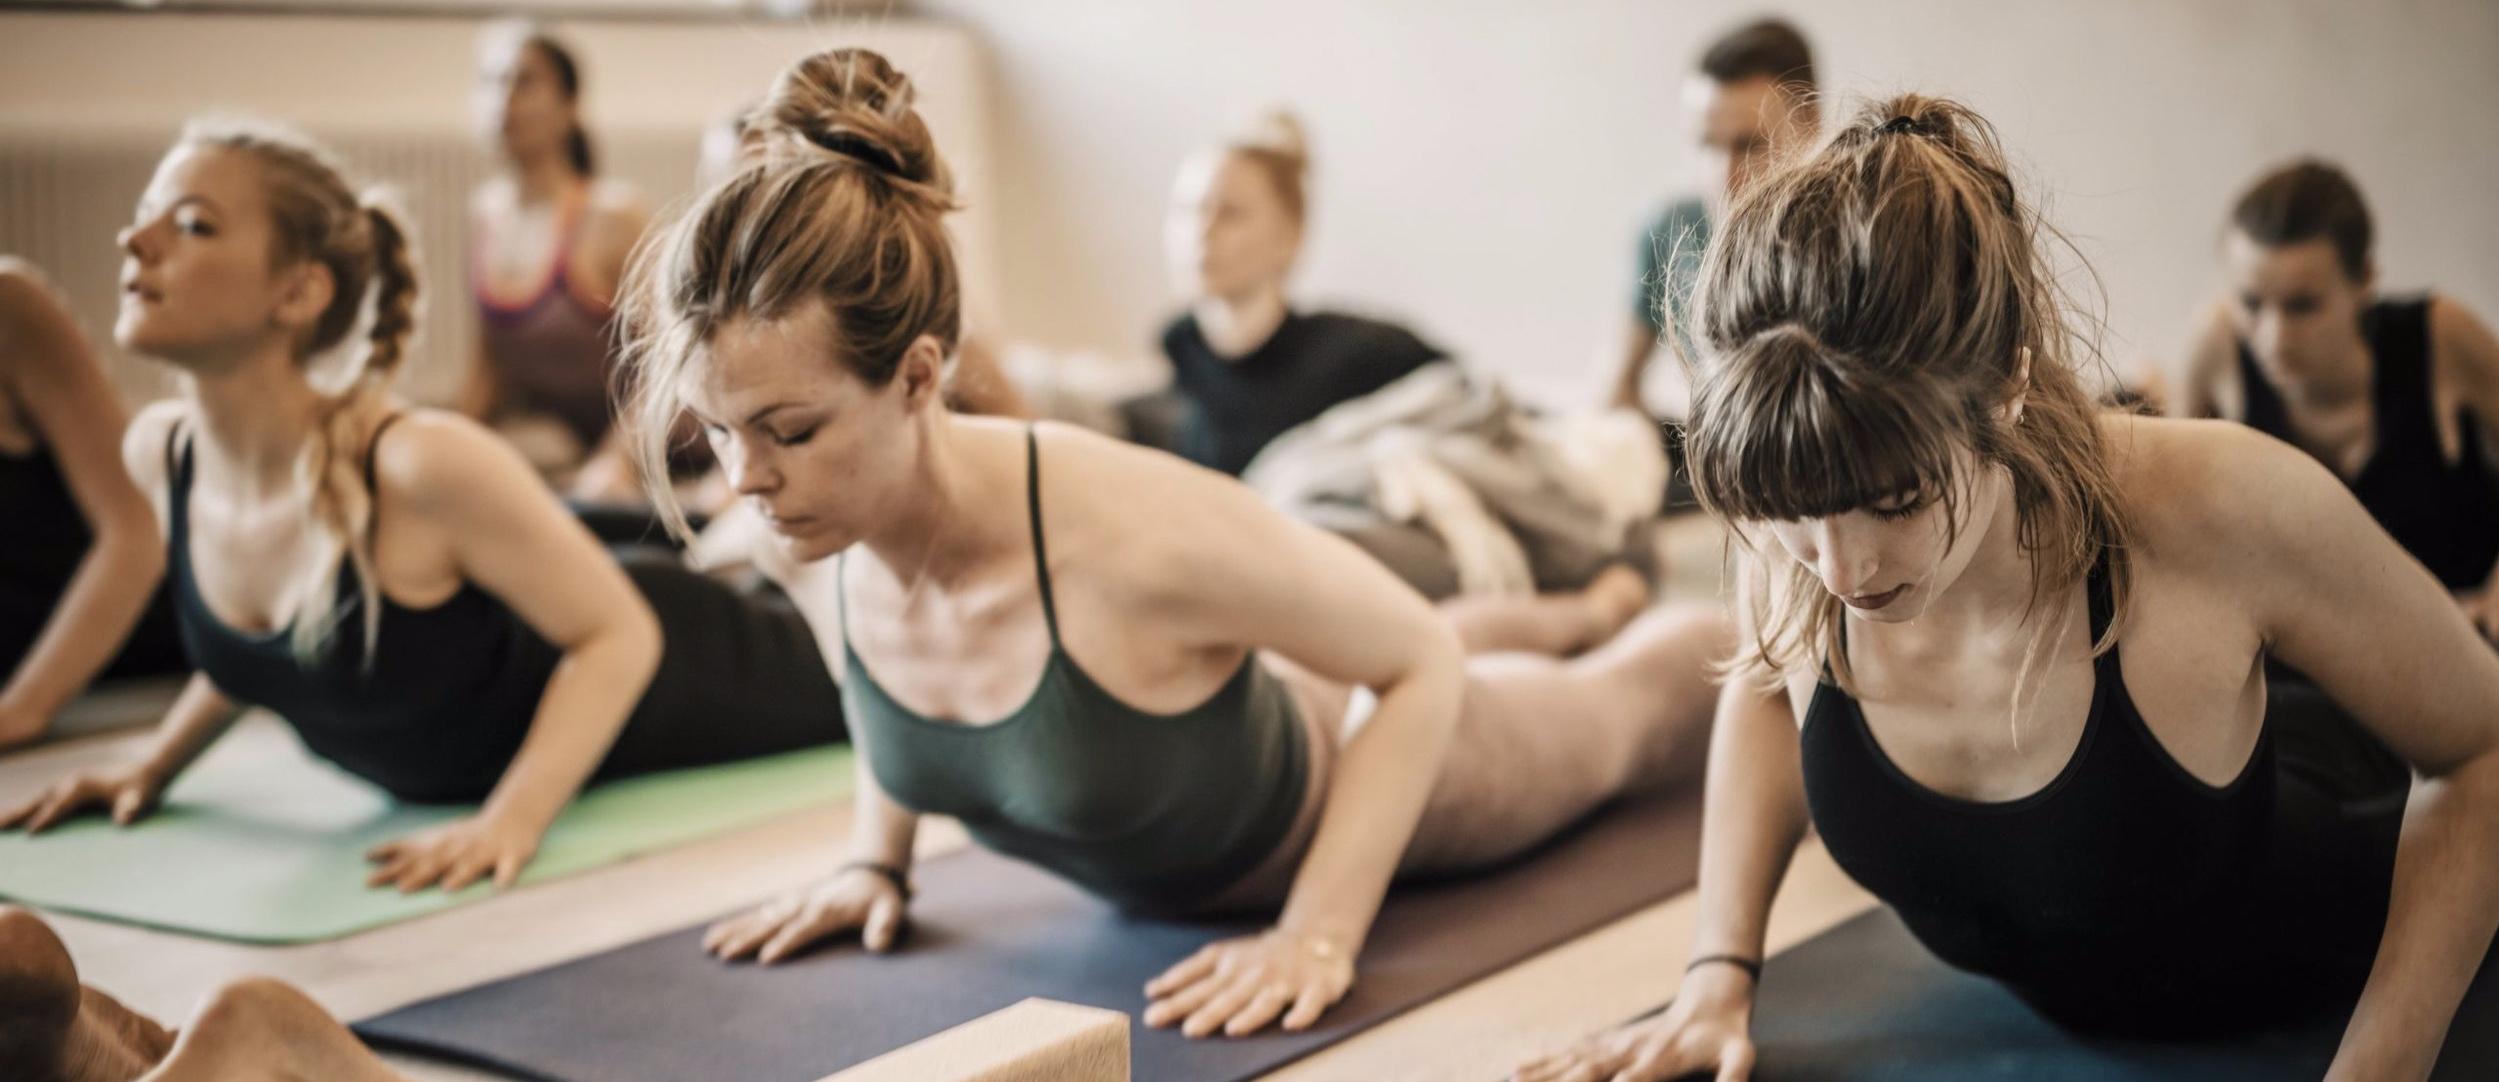 The-yoga-flat-copenhagen-yoga1.jpg